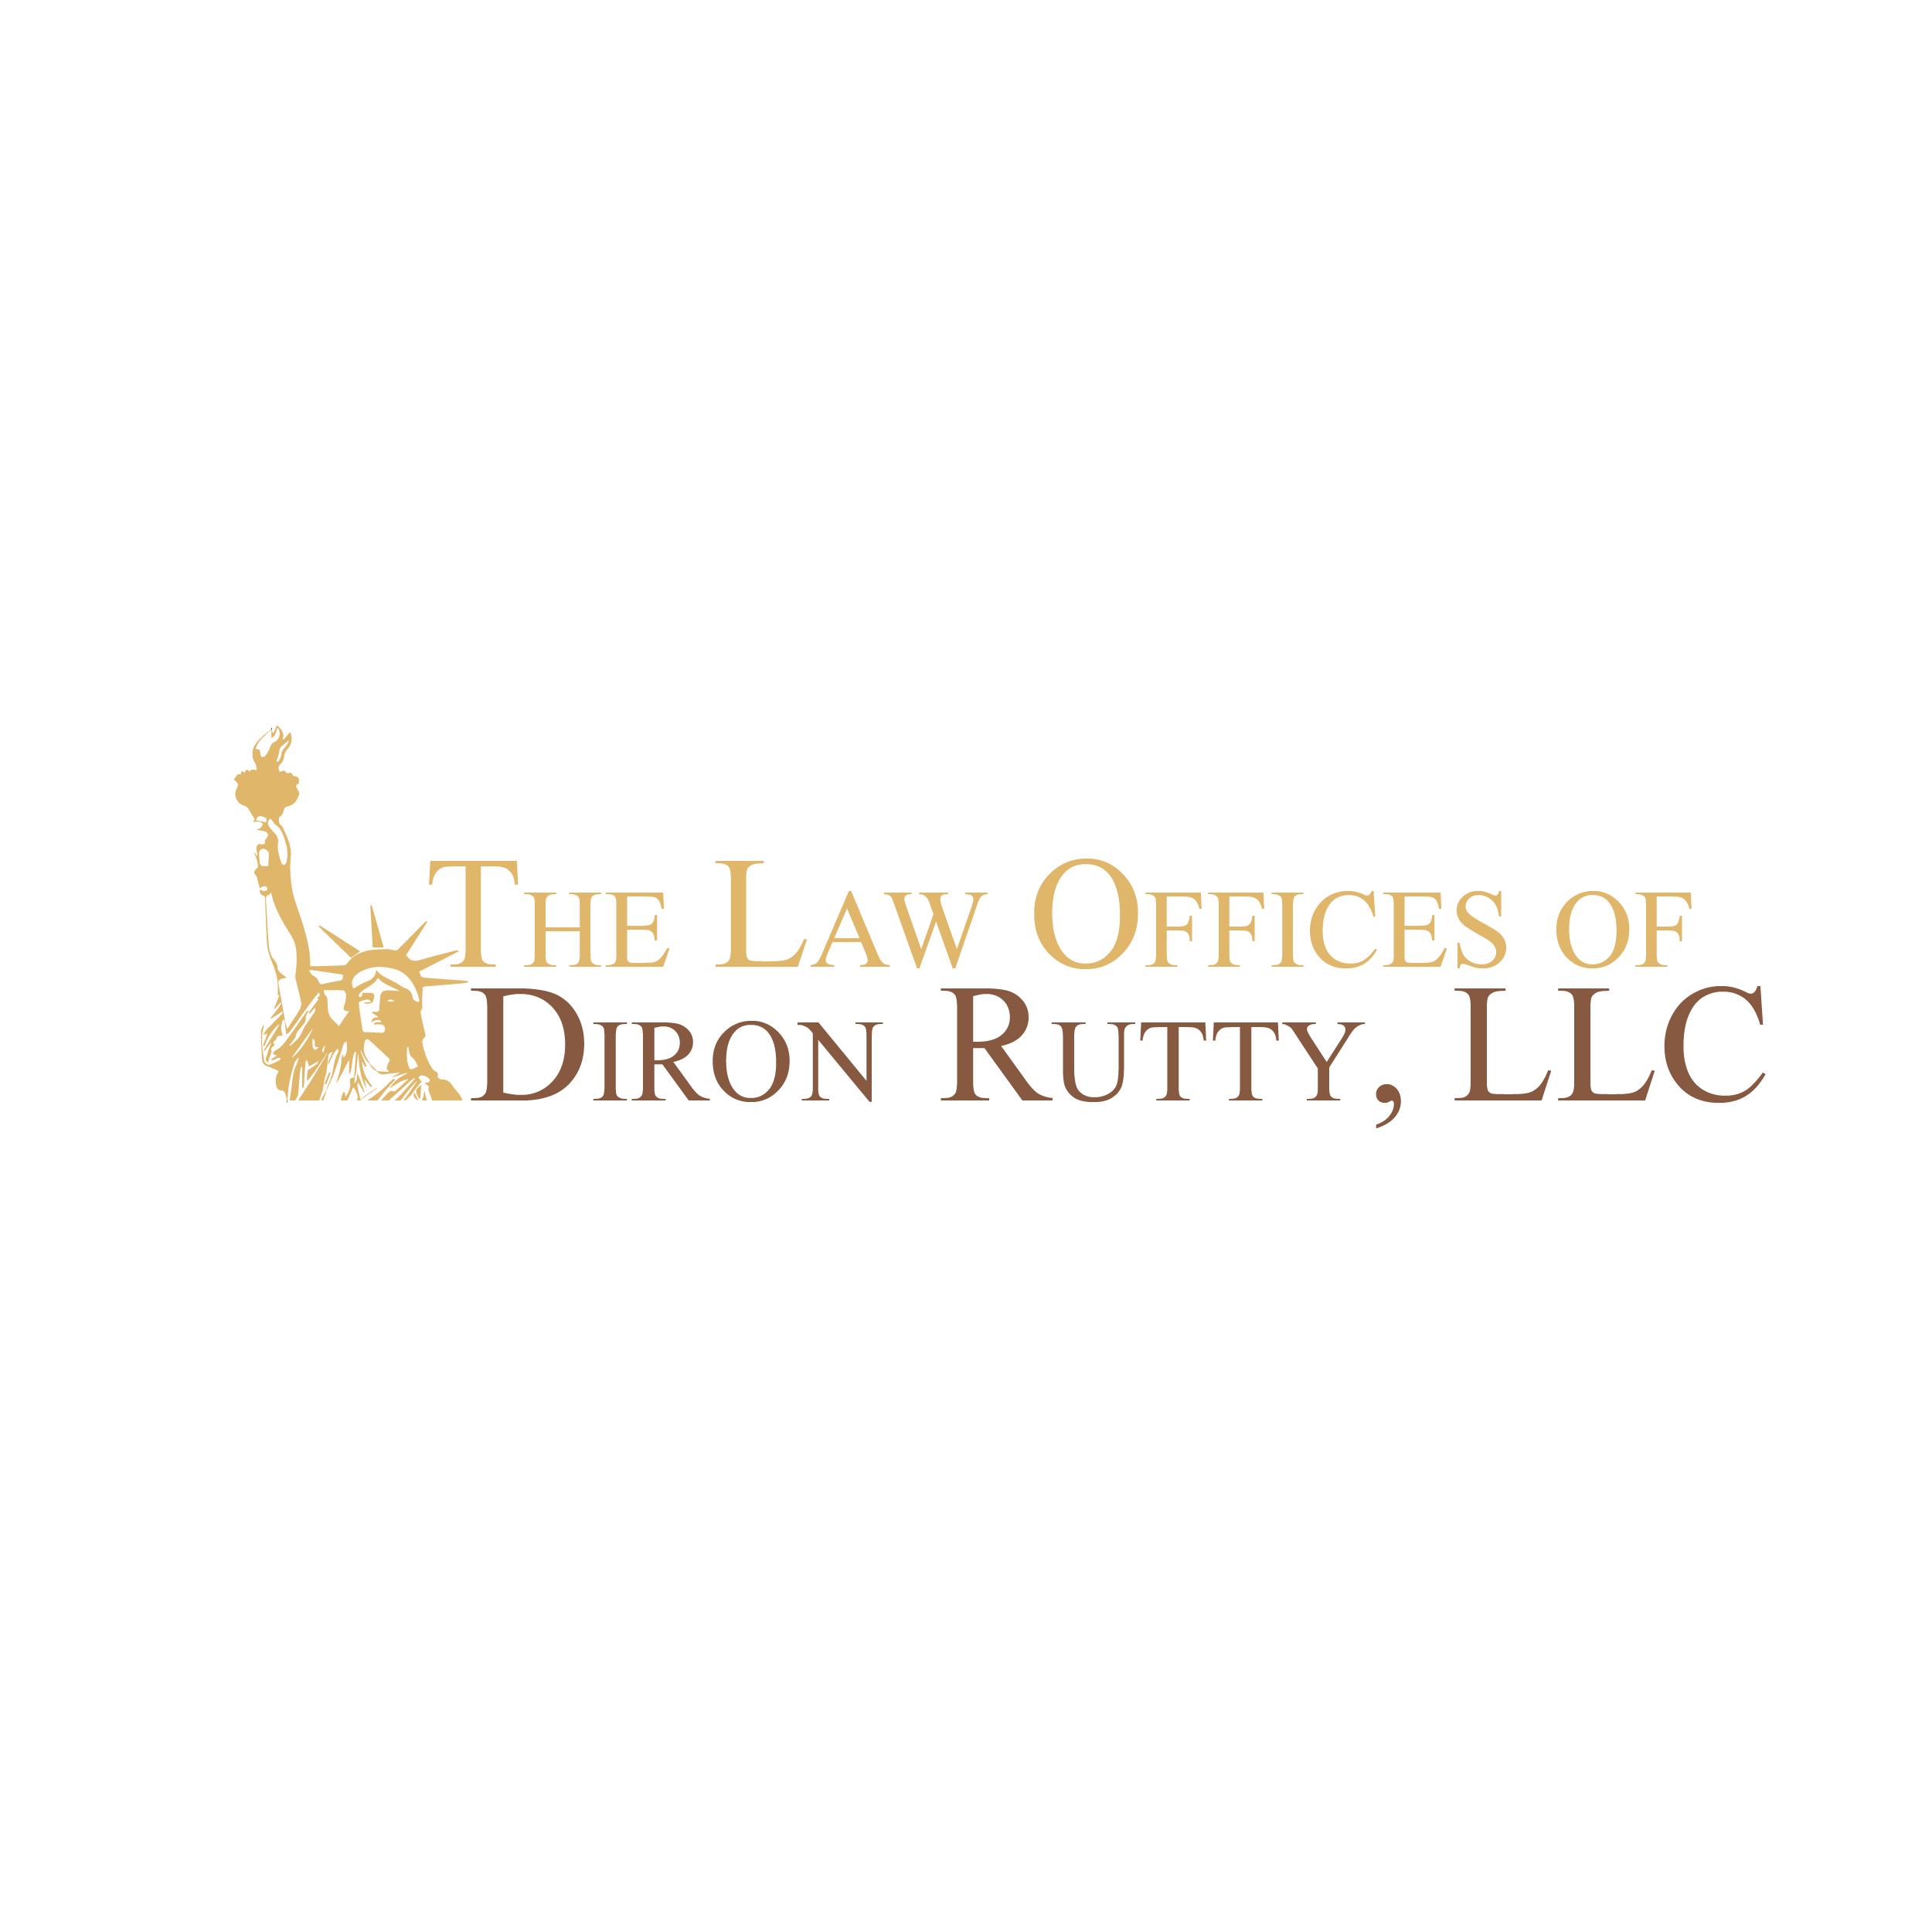 photo of Diron Rutty LLC